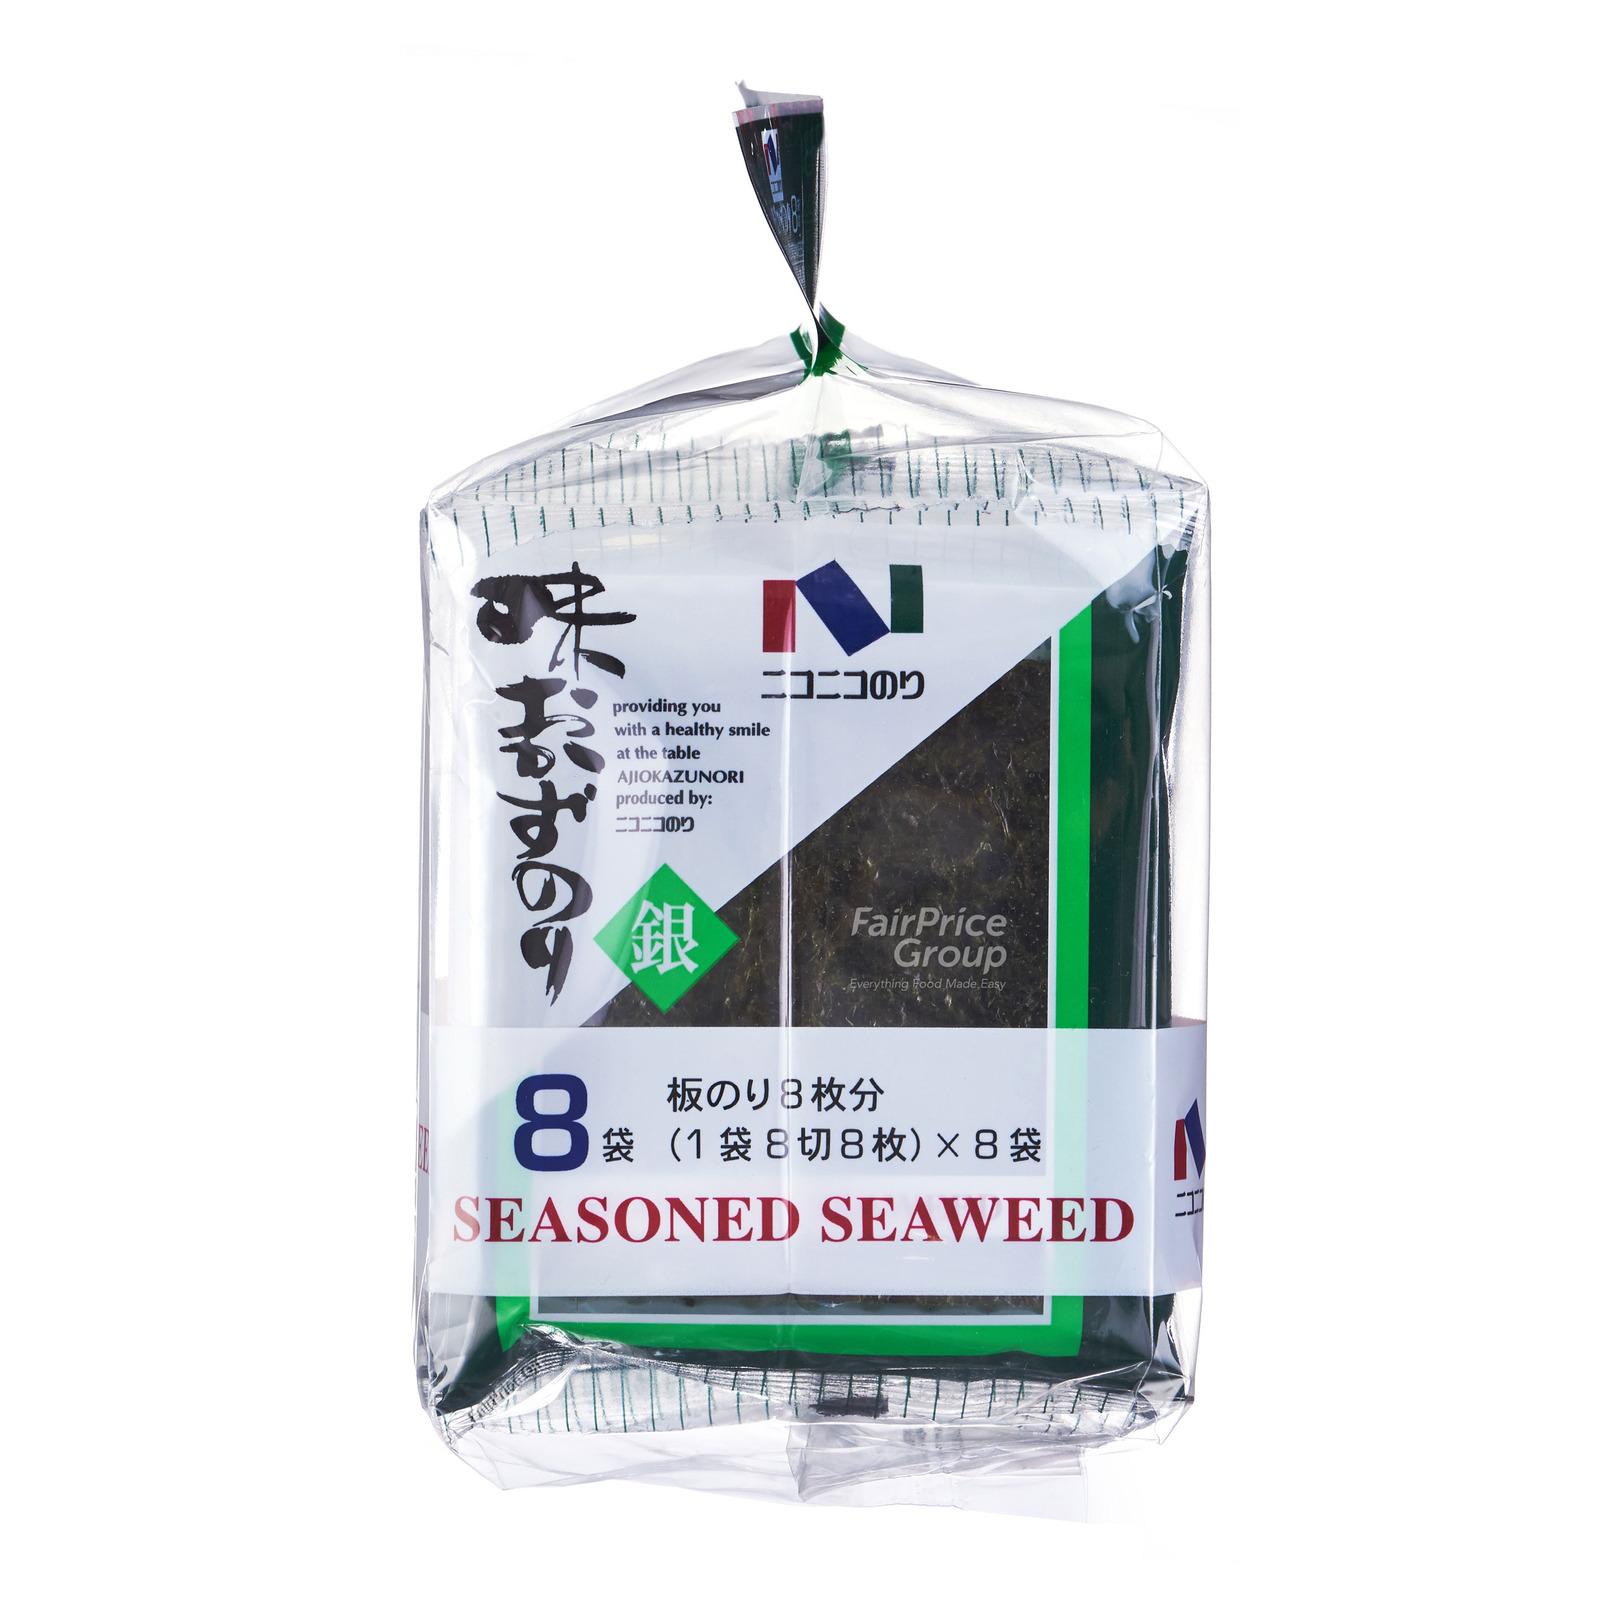 Nico Nico Seasoned Seaweed